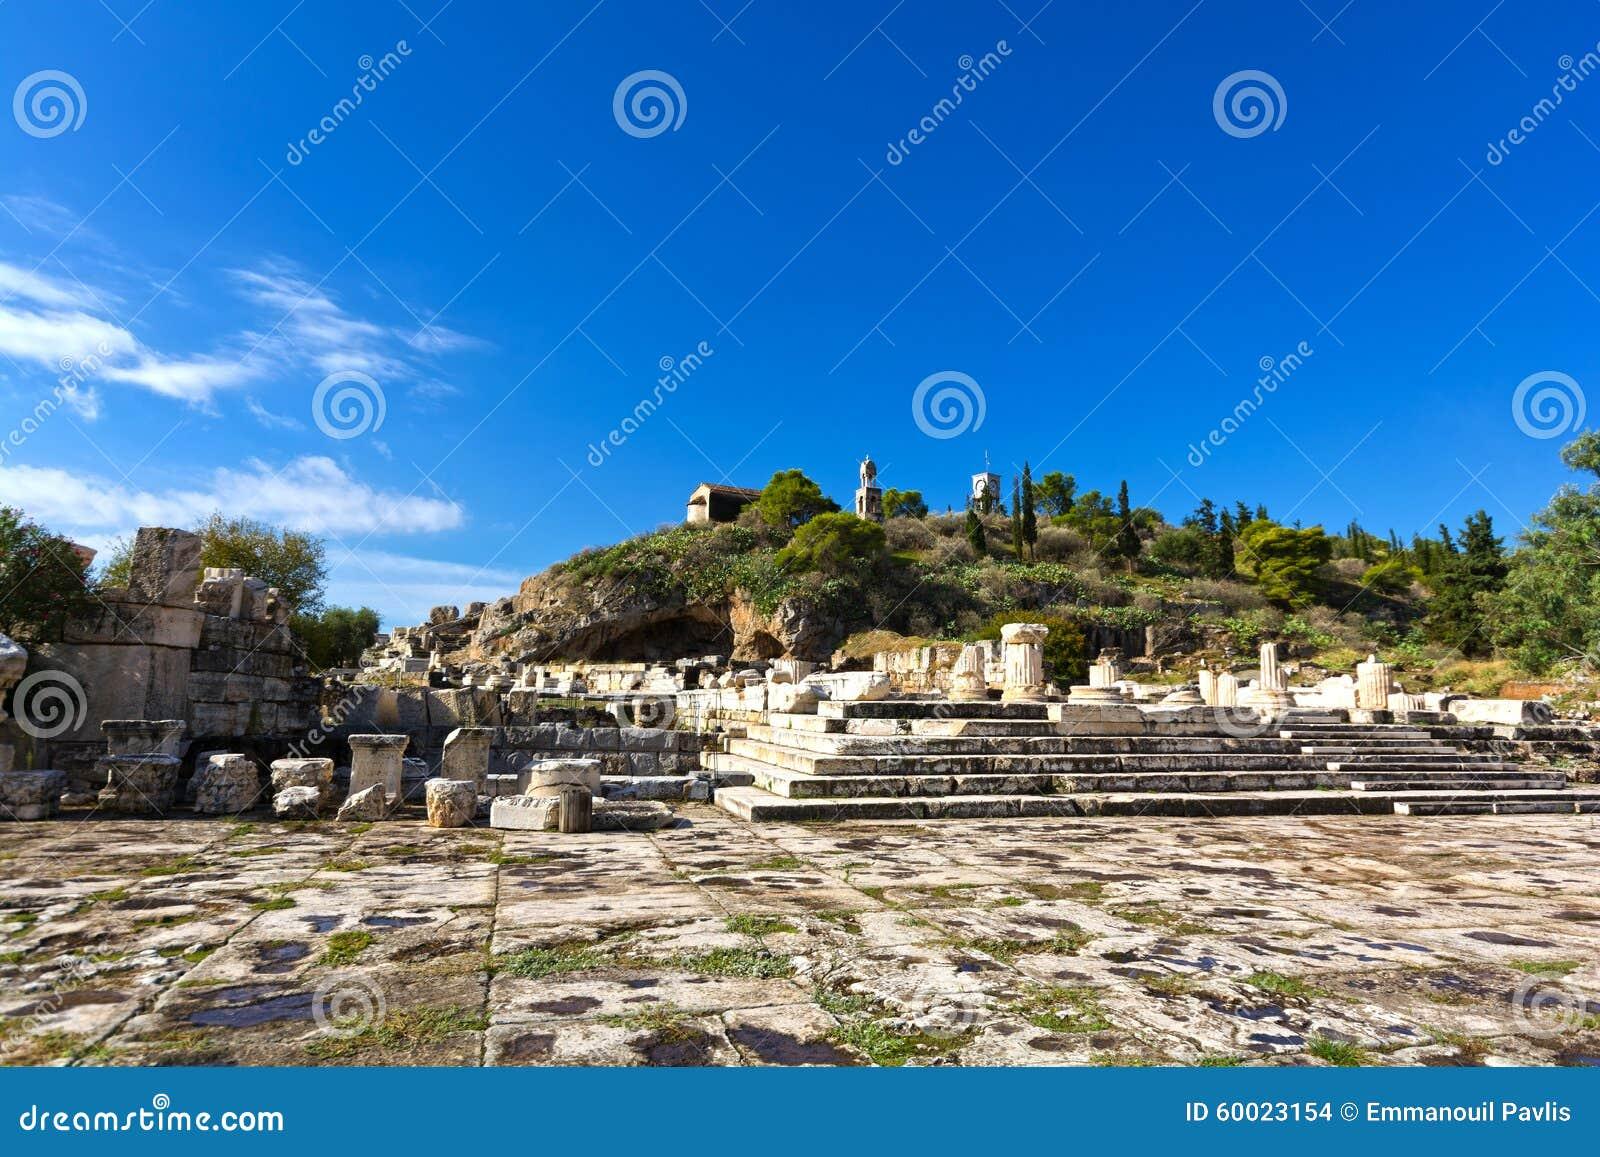 Ancient Eleusis Stock Photo - Image: 60023154